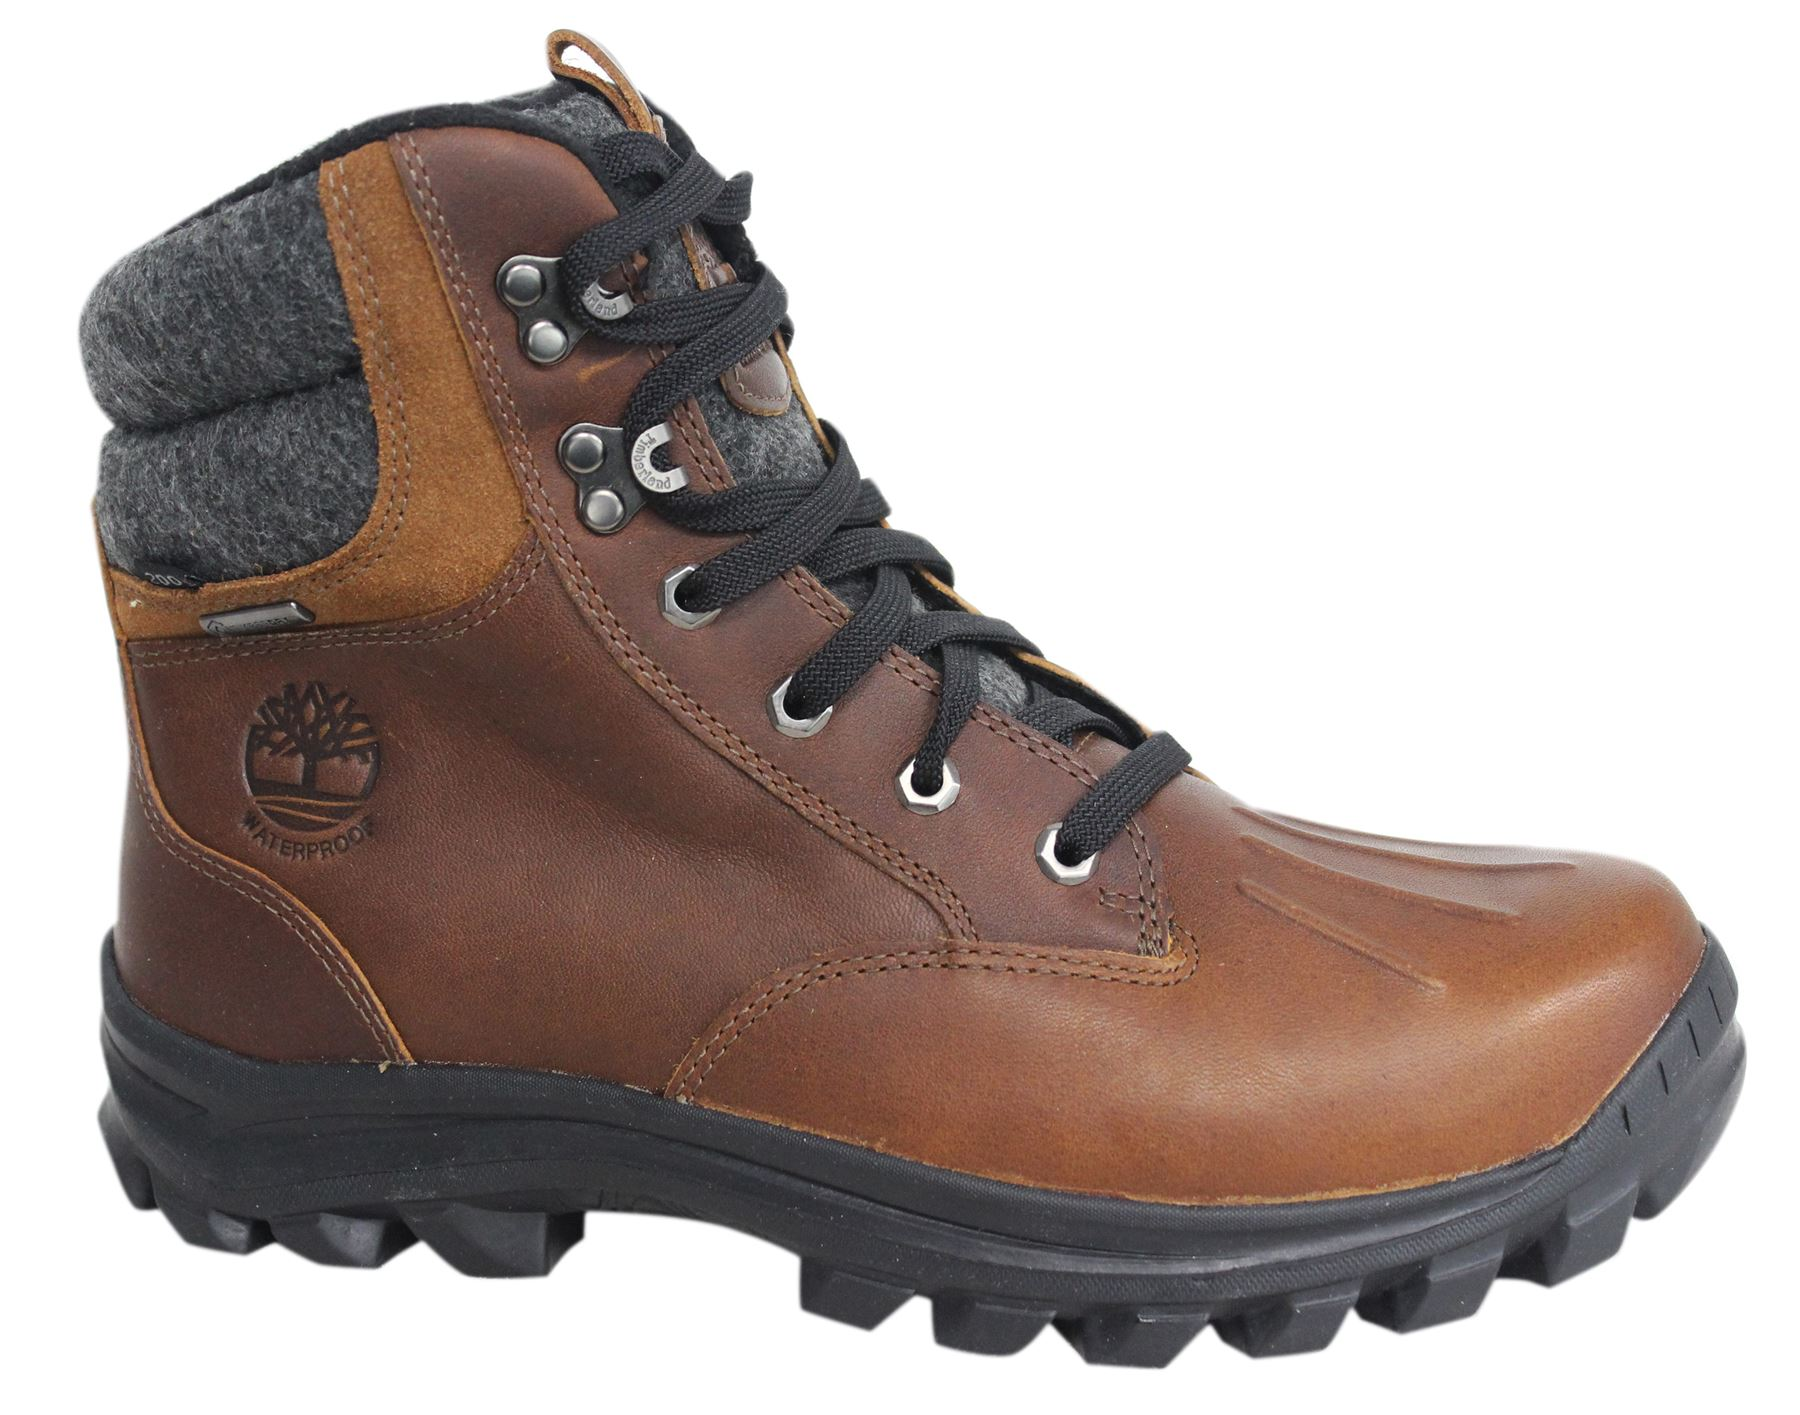 Timberland Boots Price In India Killington Half Cab Green